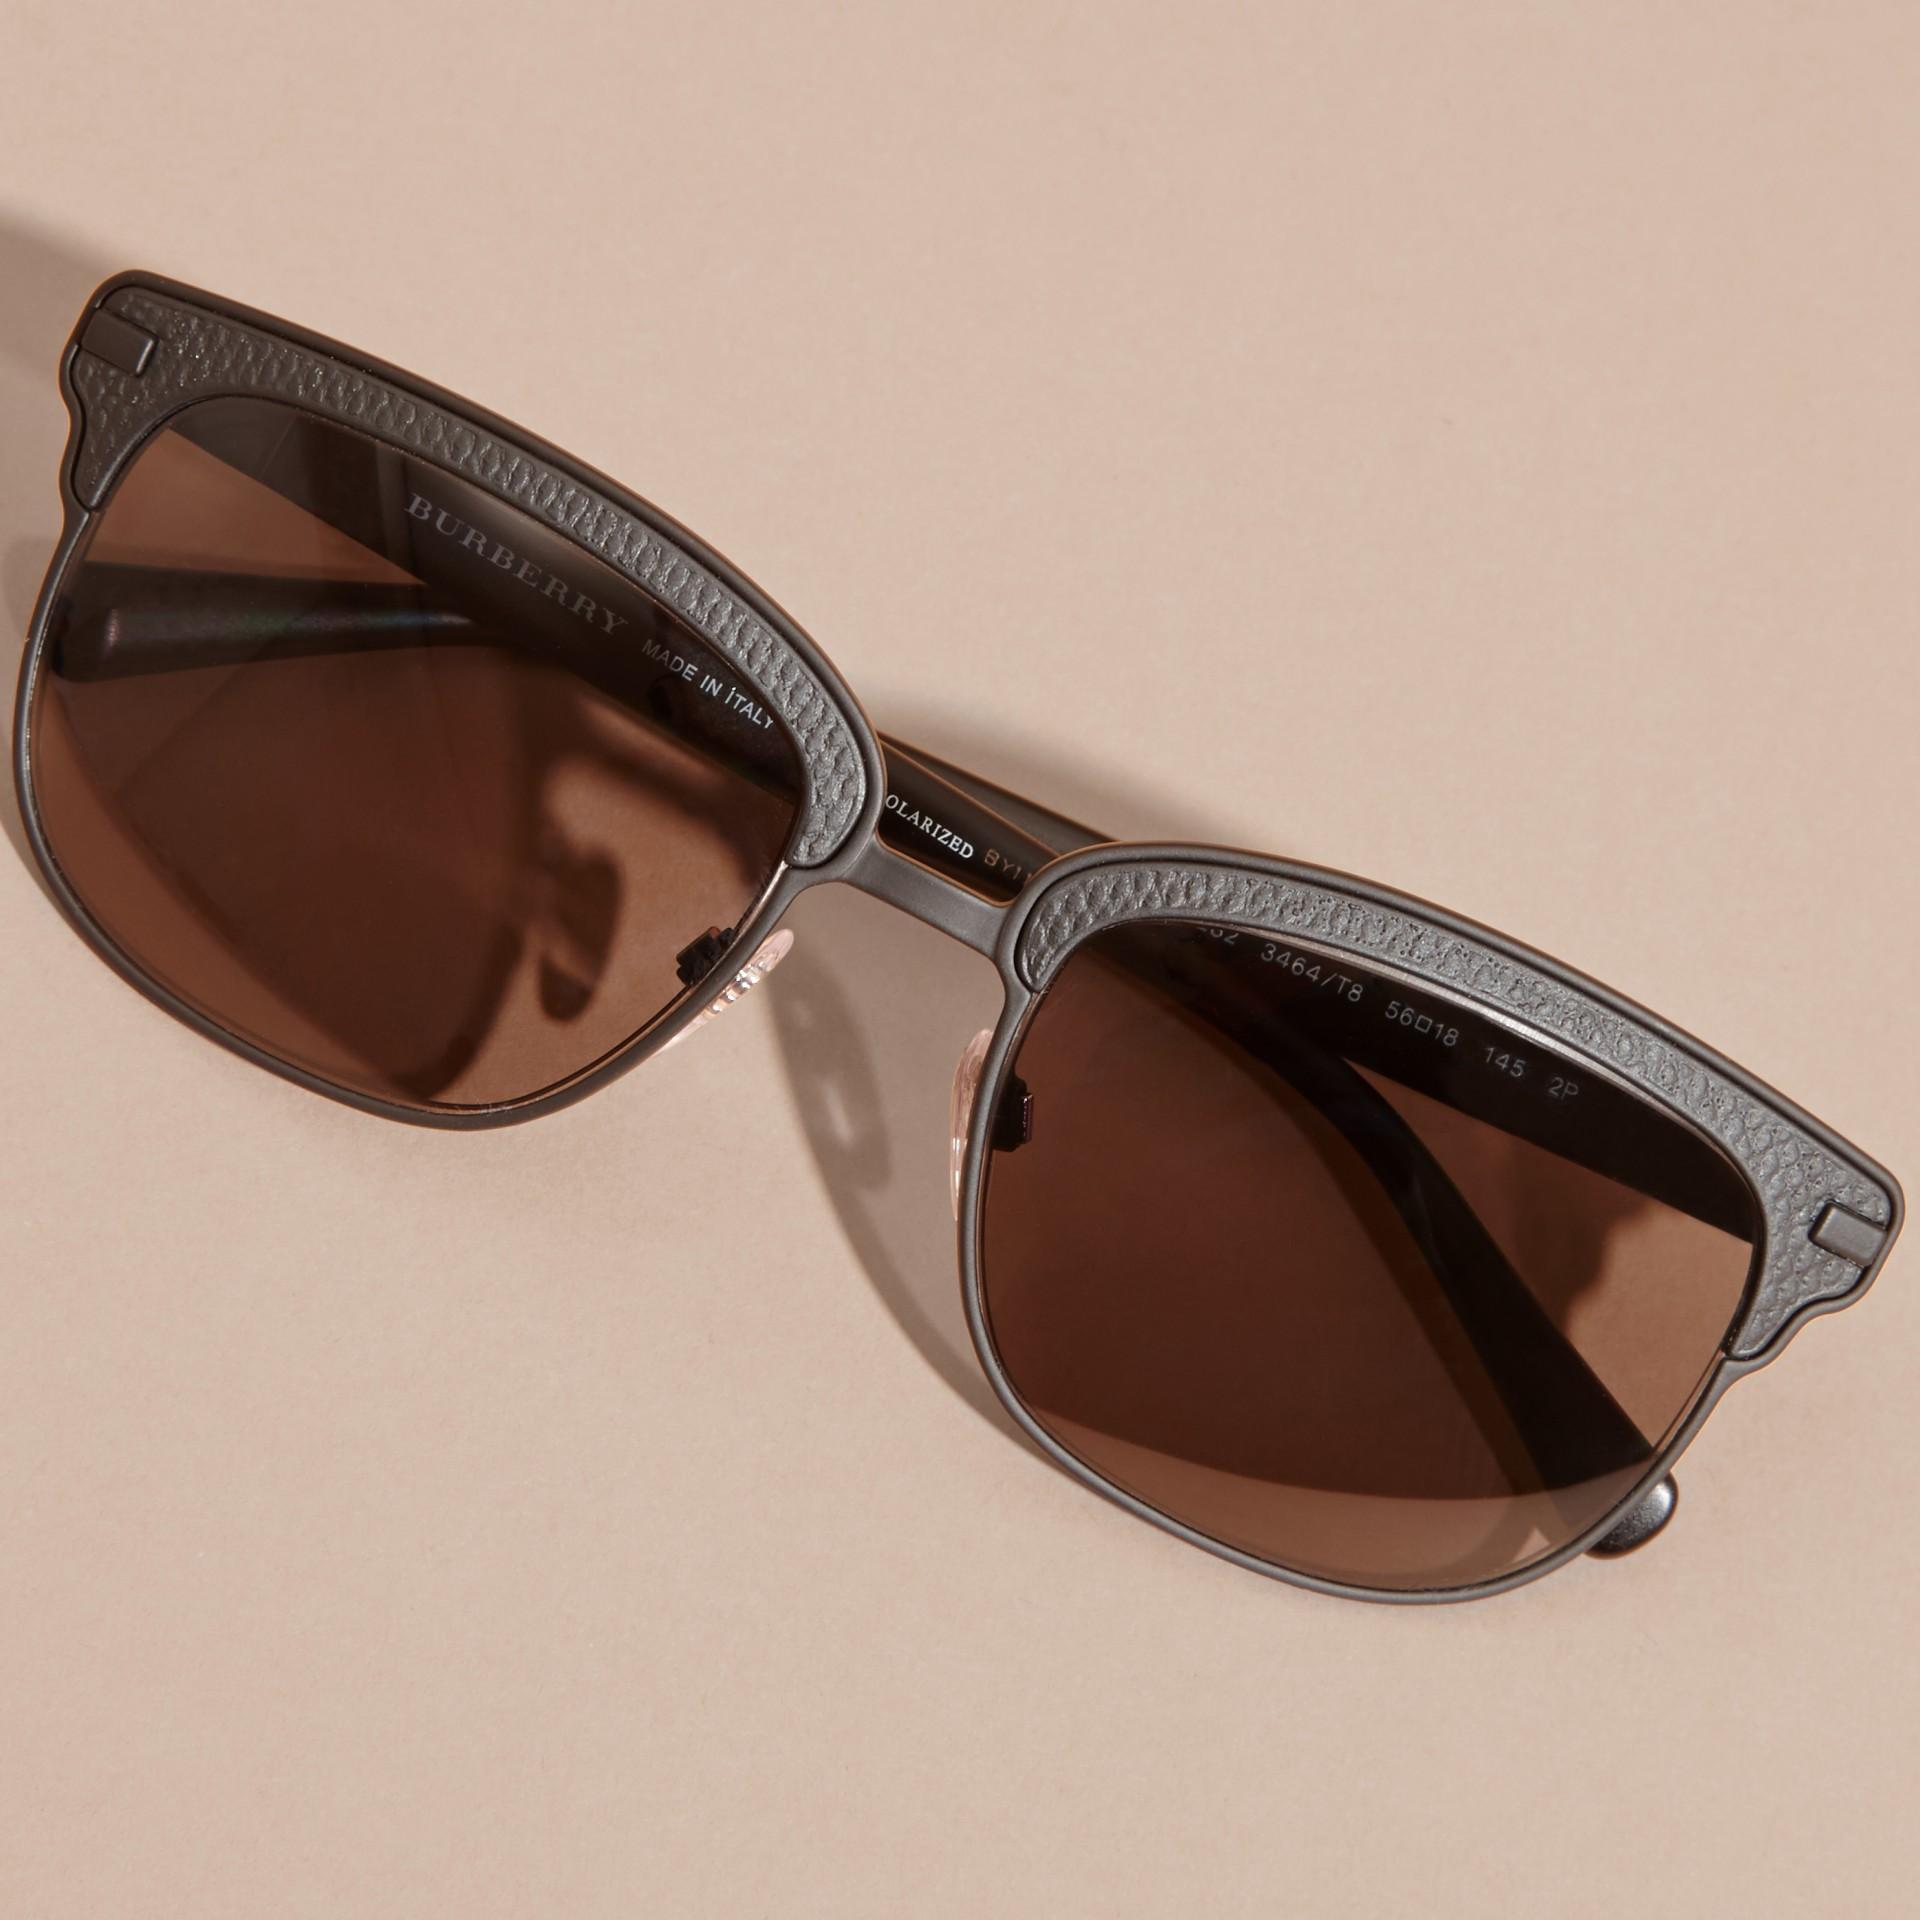 Burberry Black Frame Glasses : Textured Front Square Frame Sunglasses in Black - Men ...